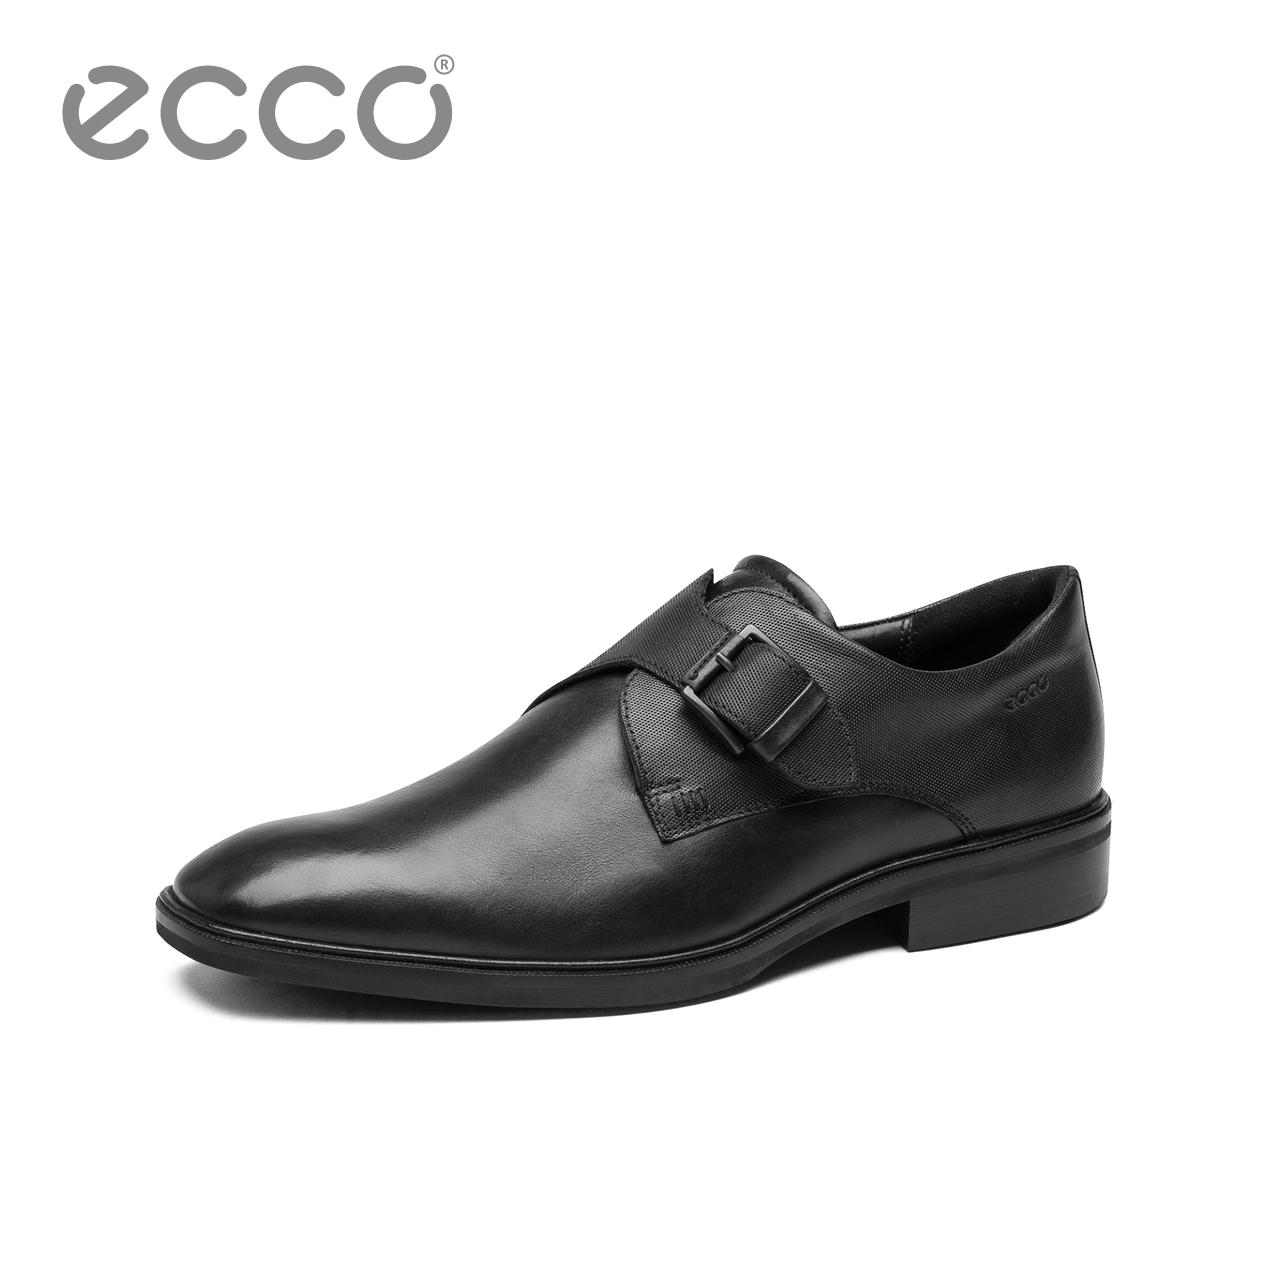 ECCO爱步透气商务休闲皮鞋男 时尚个性便捷正装鞋 意兰诺623084